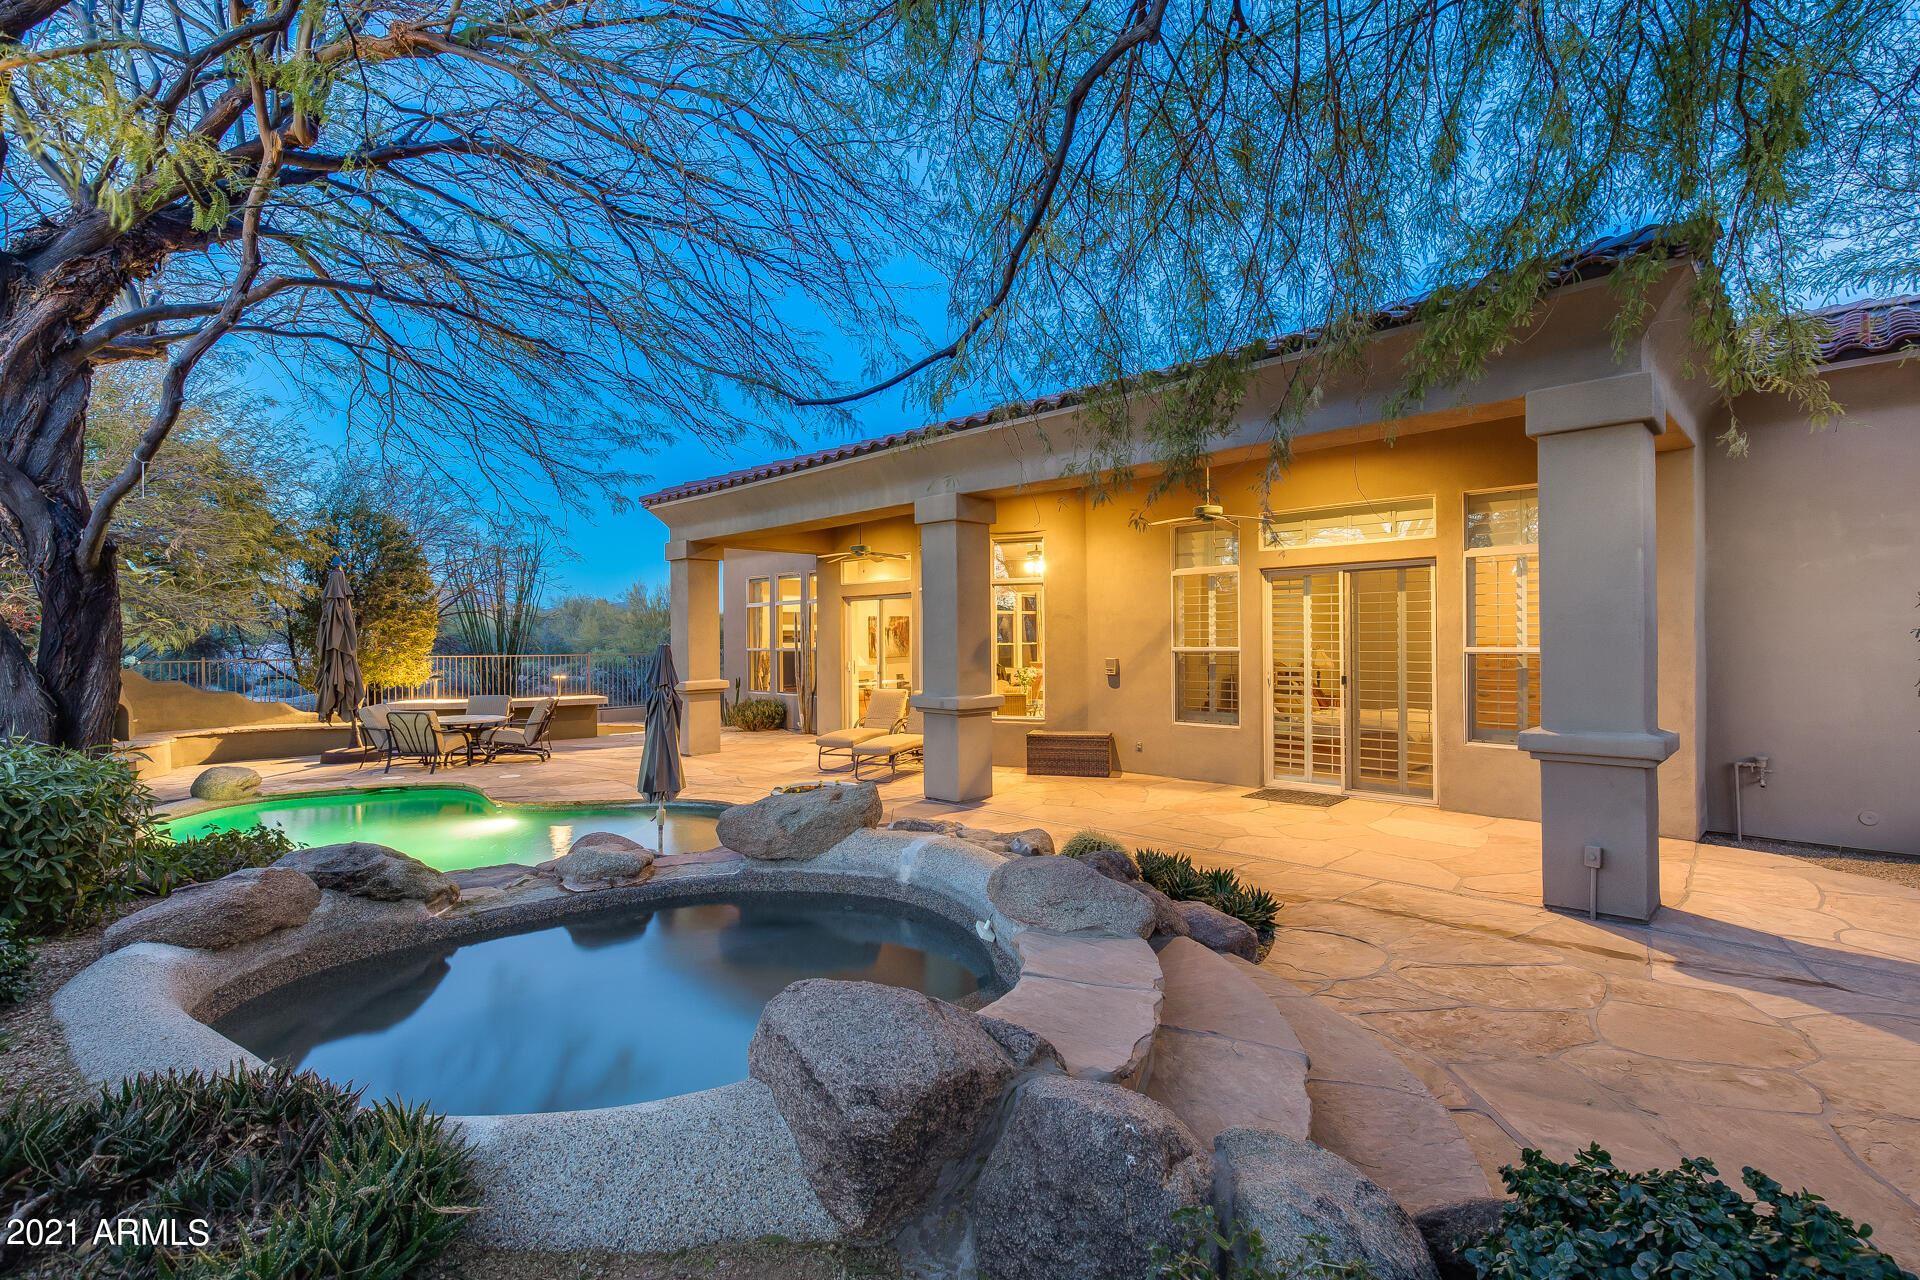 Photo of 33668 N 78TH Place, Scottsdale, AZ 85266 (MLS # 6200292)